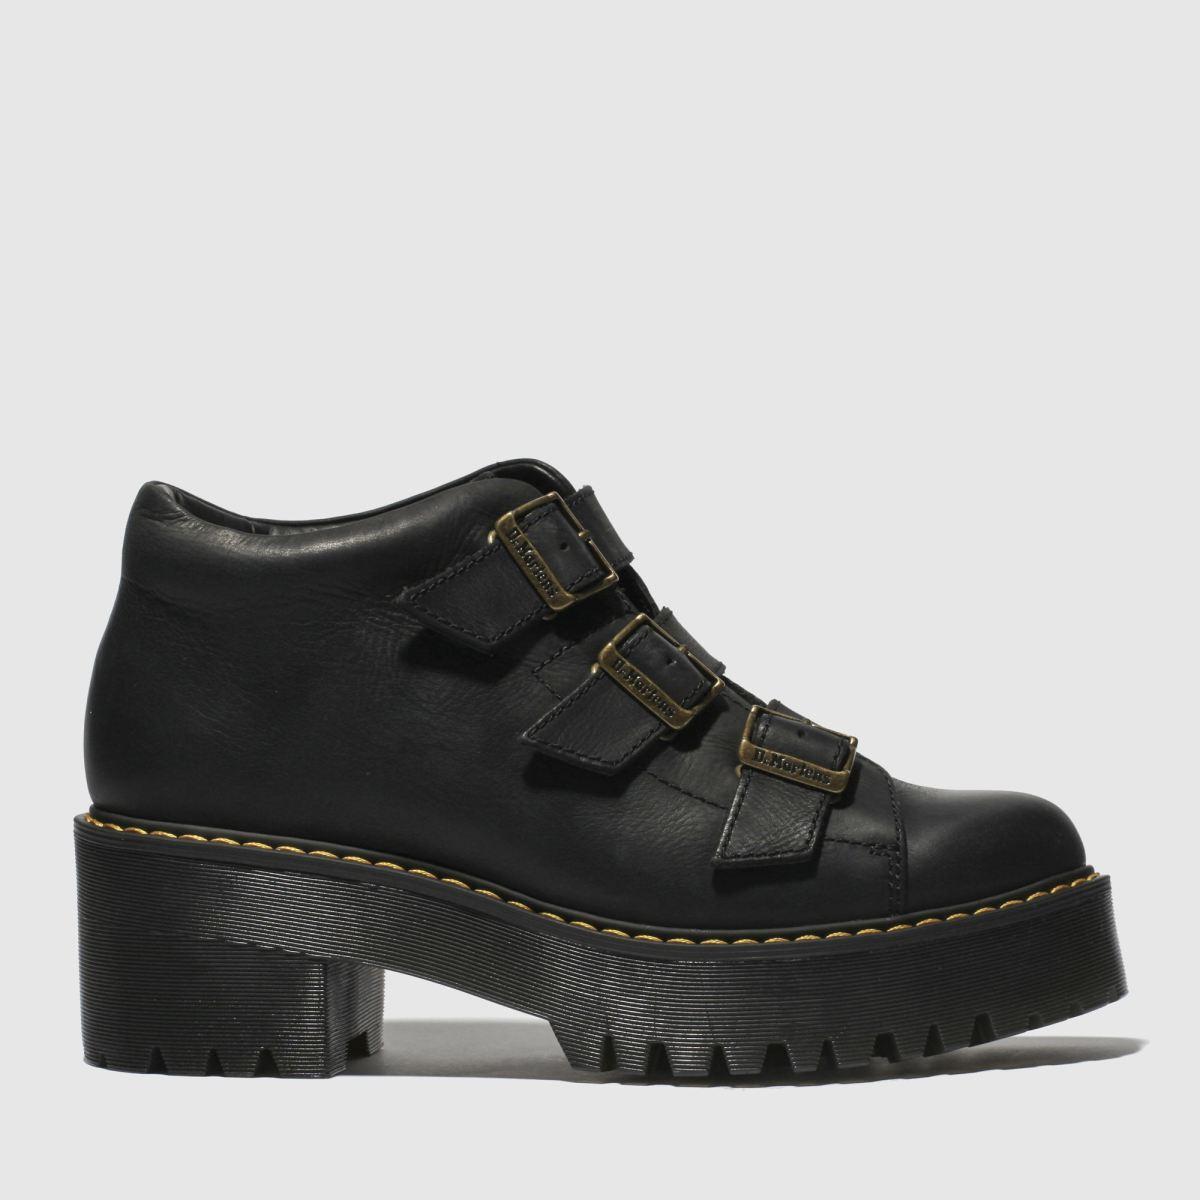 Dr Martens Black Coppola Boots